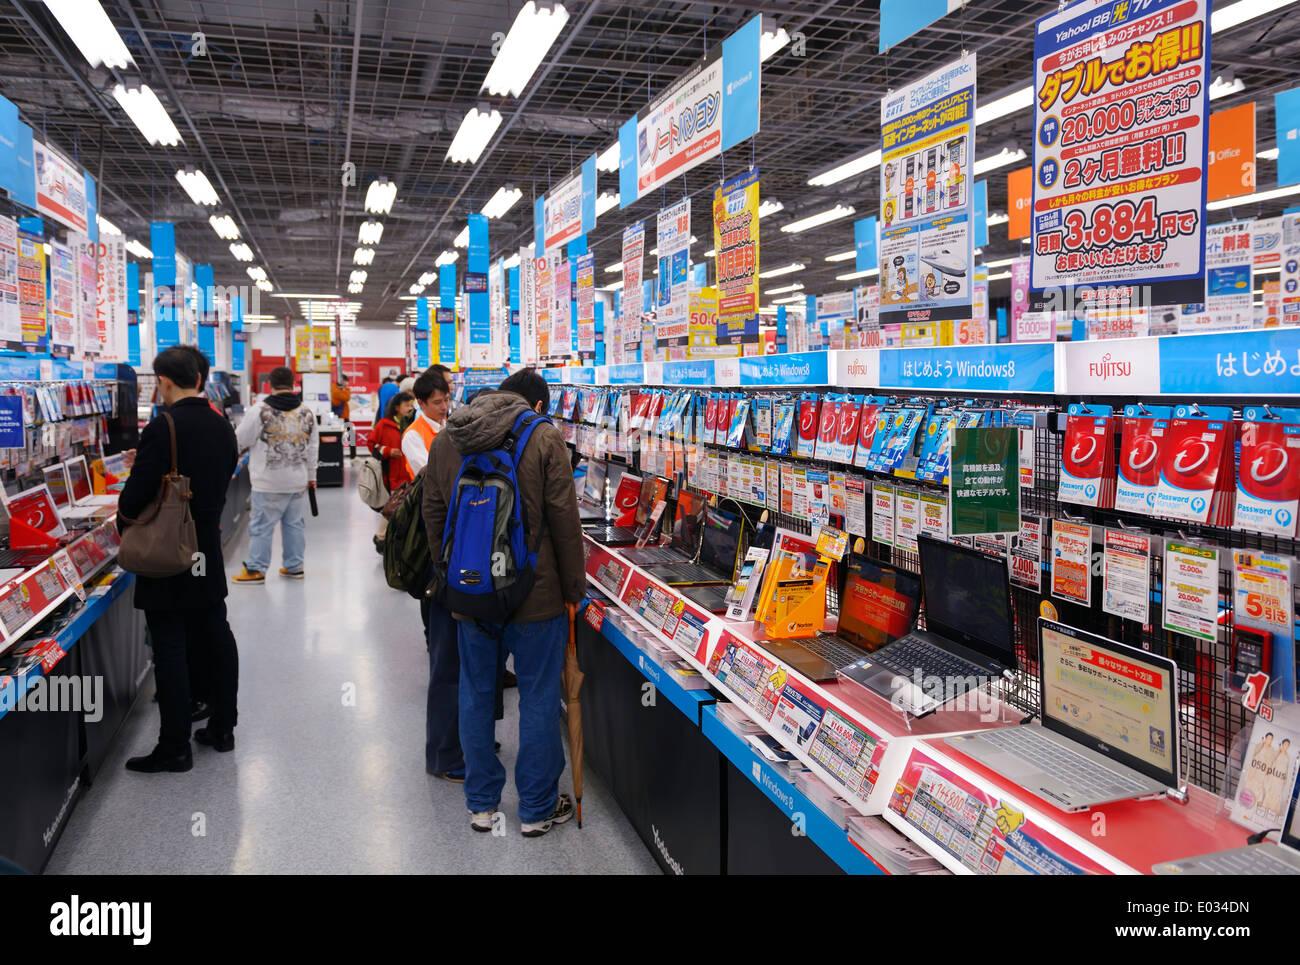 People at large electronics store Yodobashi Camera, Yodobashi-Akiba in Akihabara, Tokyo, Japan. - Stock Image